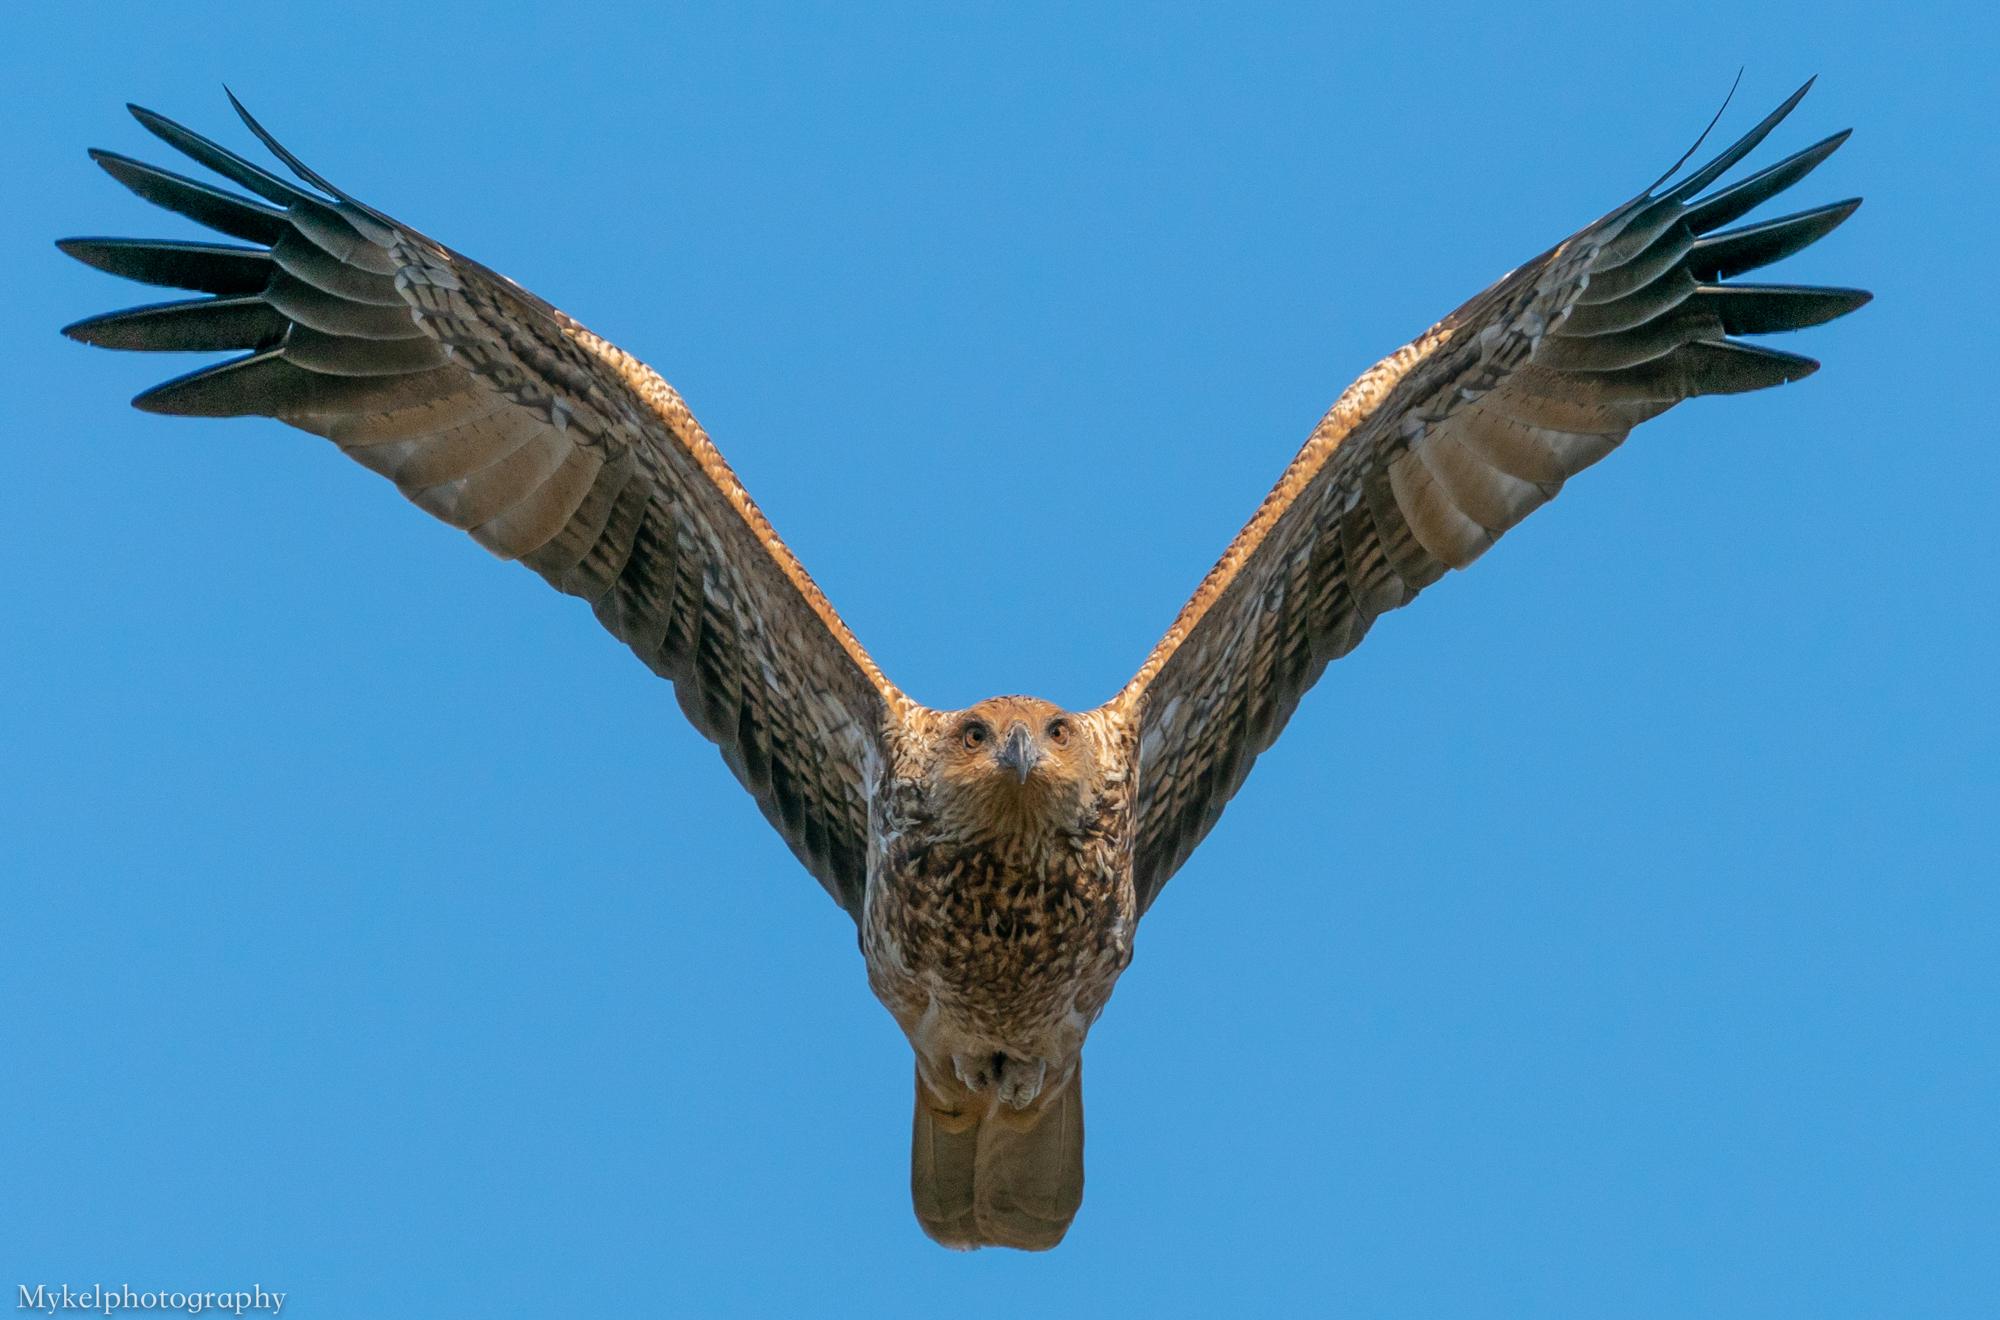 Whistling Kite, Haliastur sphenurus Accipitridae